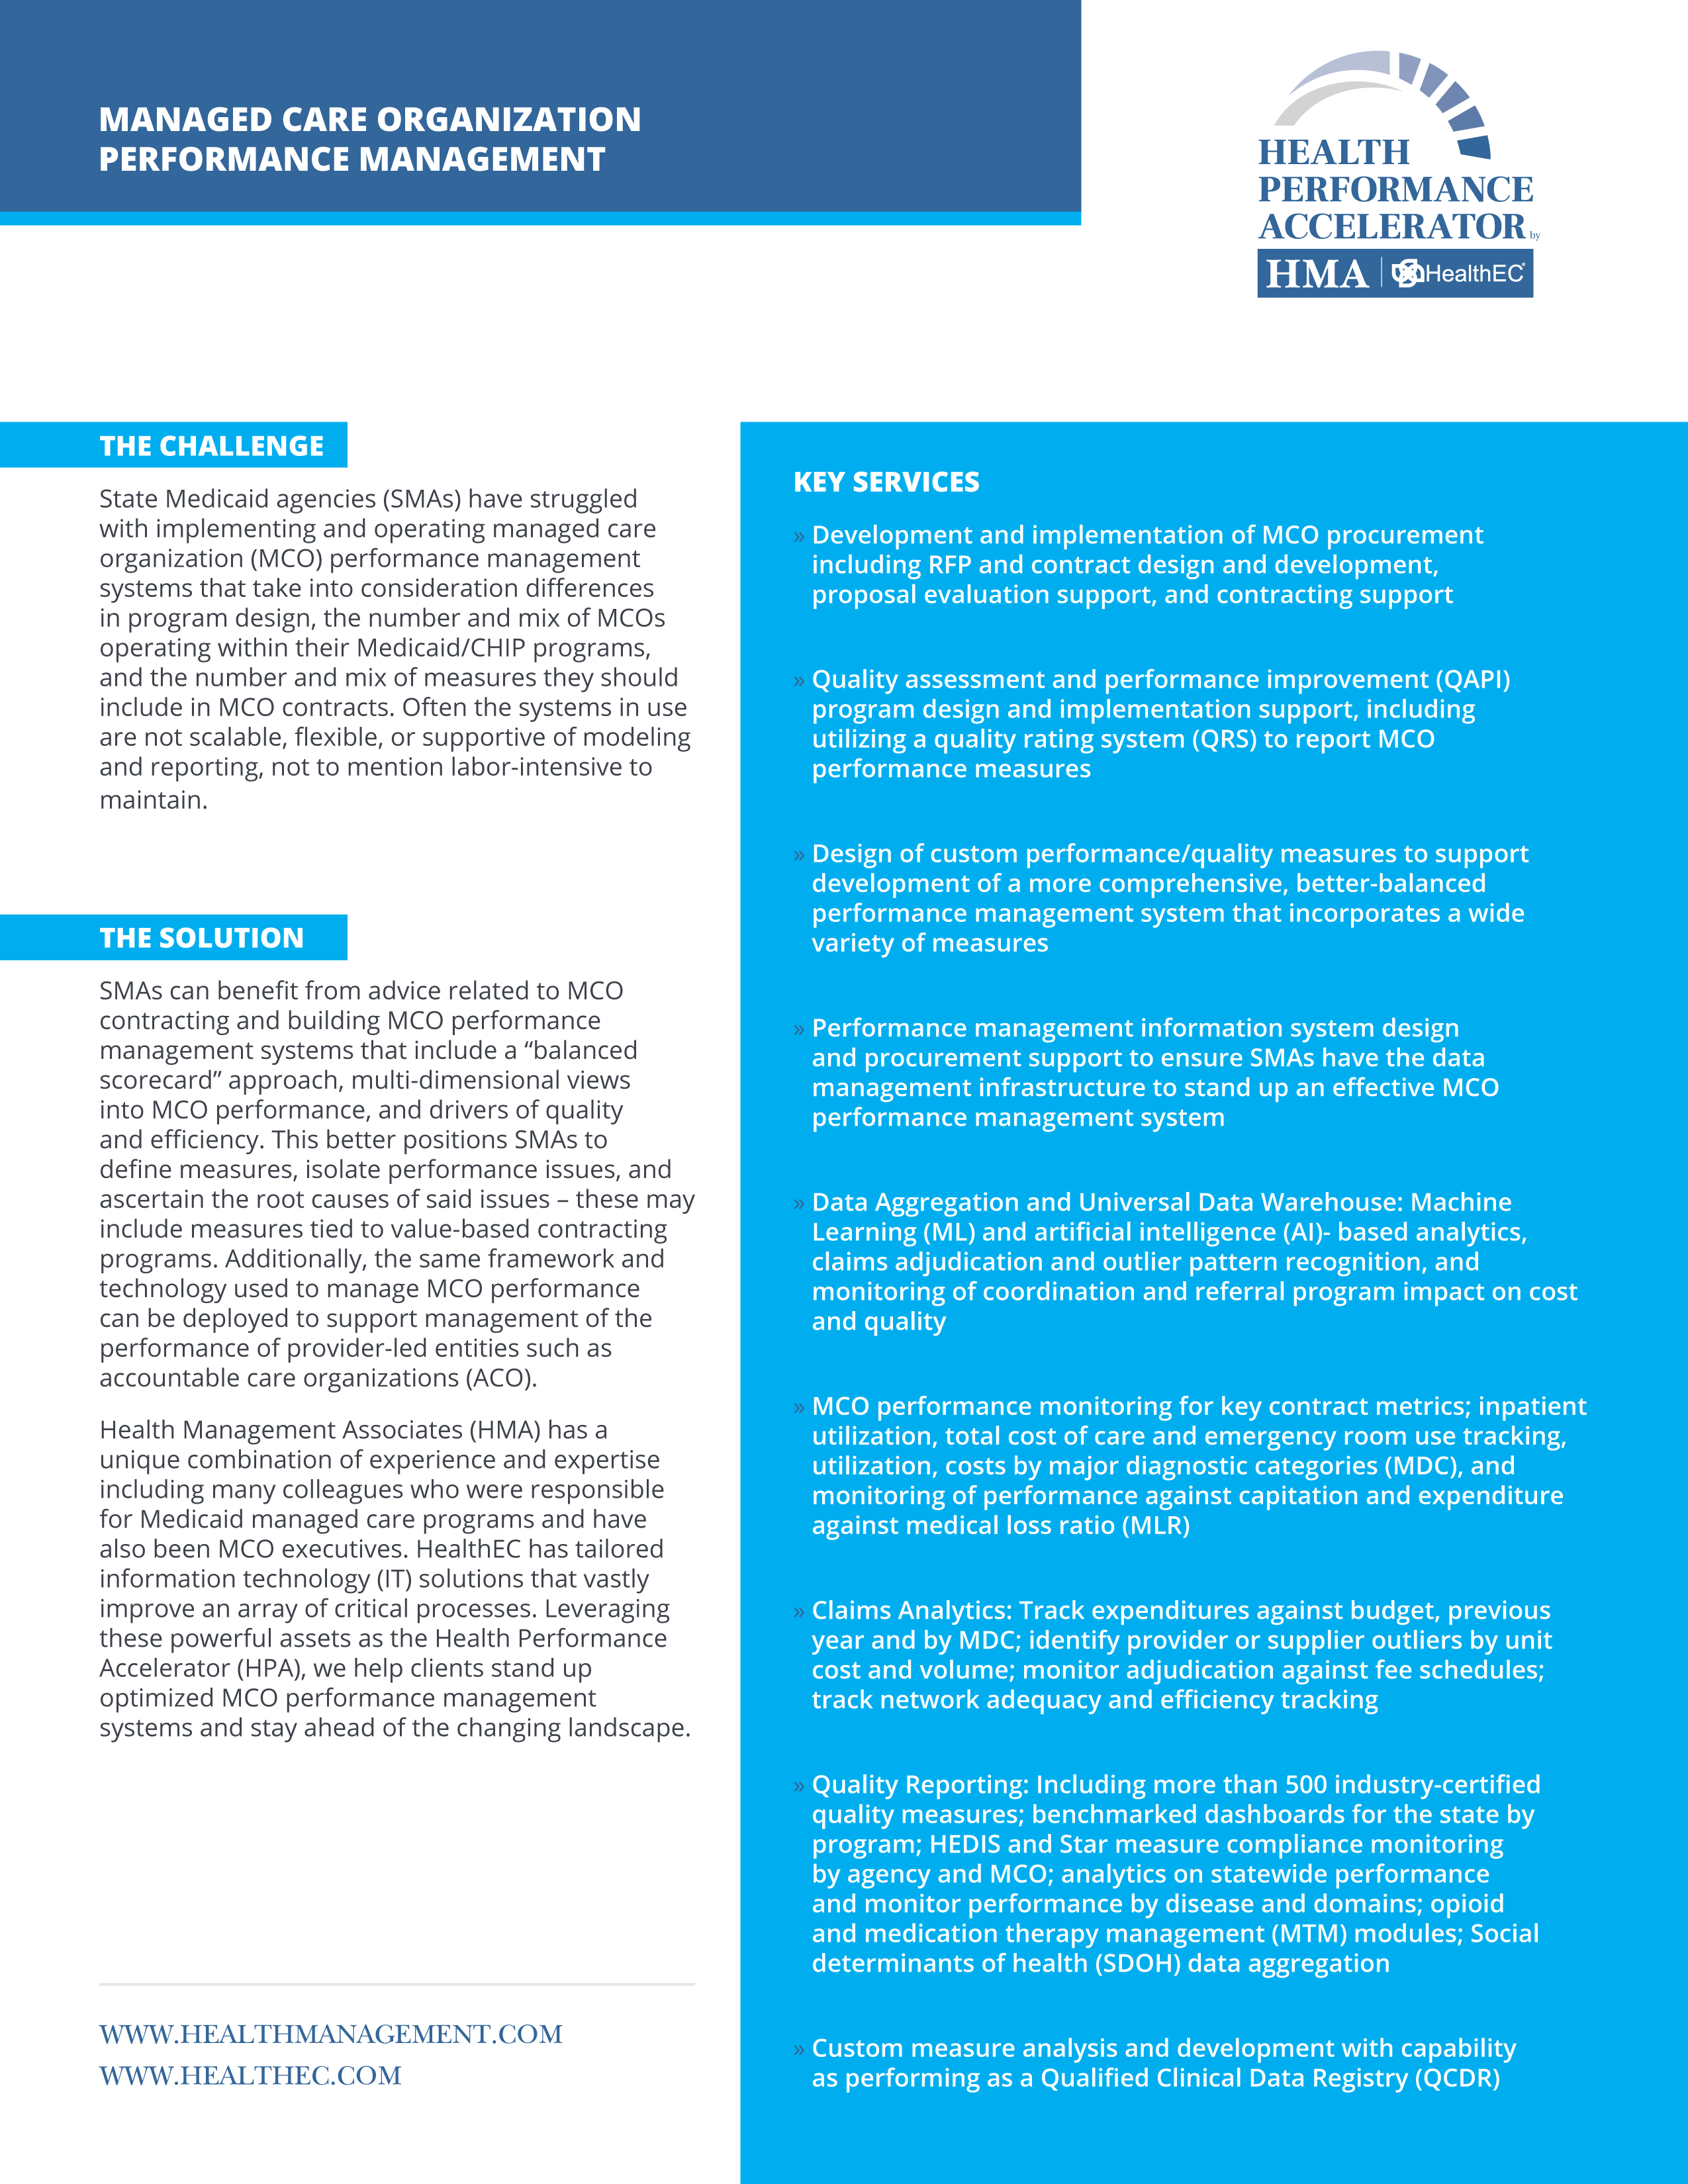 MCO Performance Management1 copy